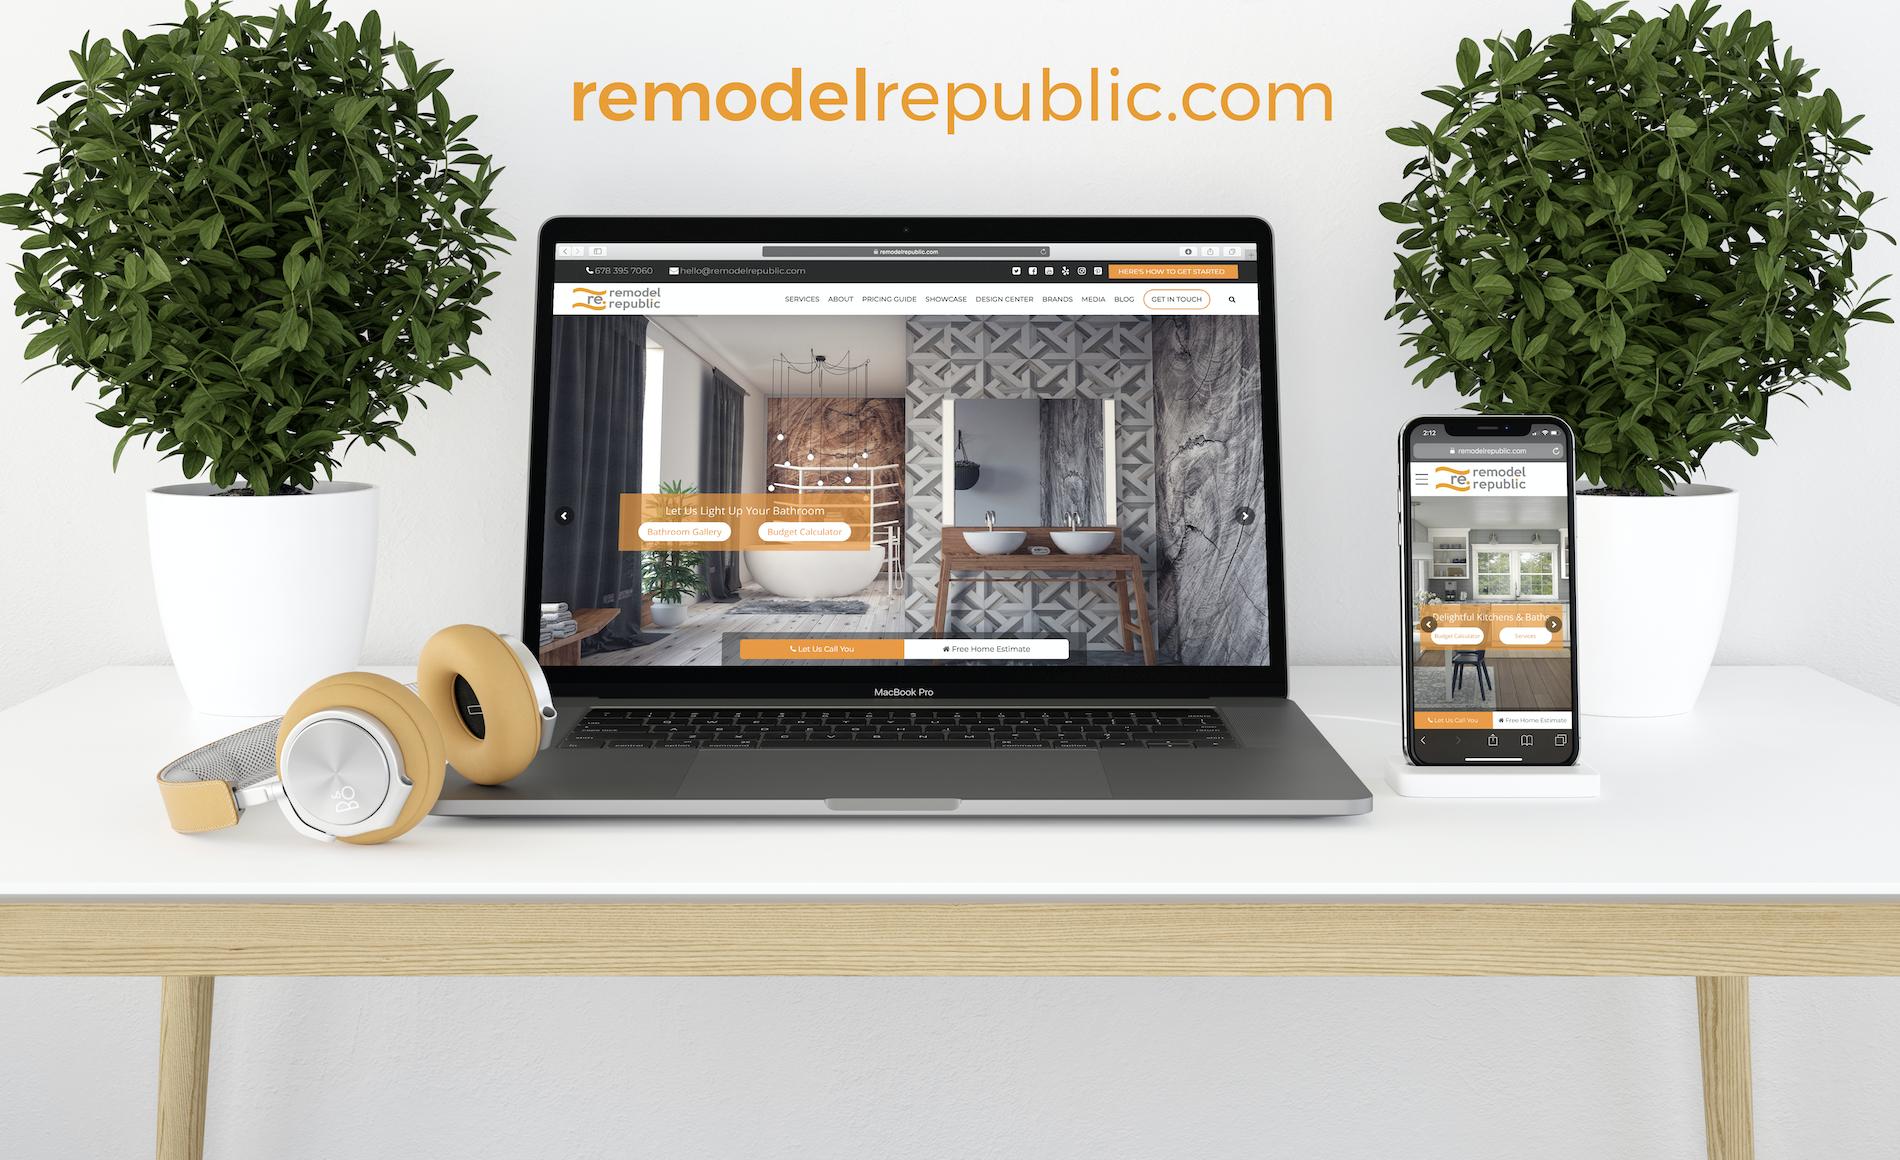 //www.twinleo.com/wp-content/uploads/2019/02/slide-for-remodelrepublic.png